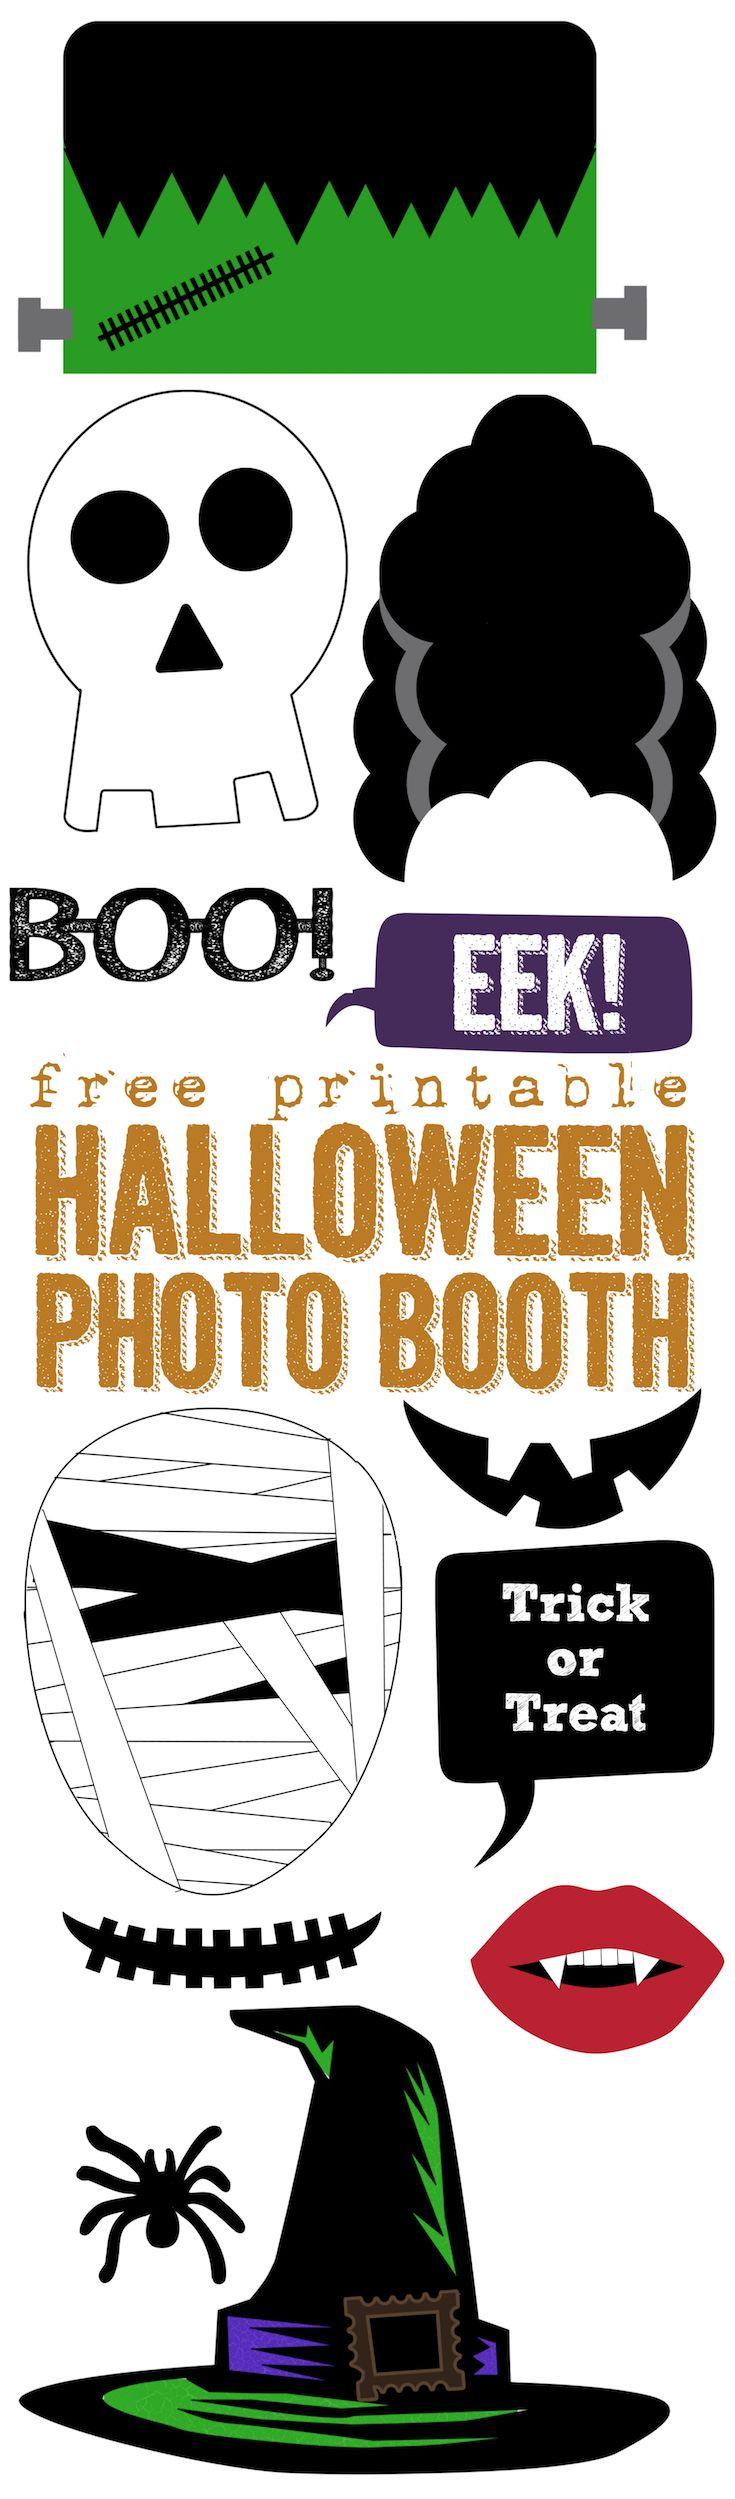 image regarding Halloween Photo Booth Props Printable Free named No cost Printable Halloween Picture Booth Halloween Halloween